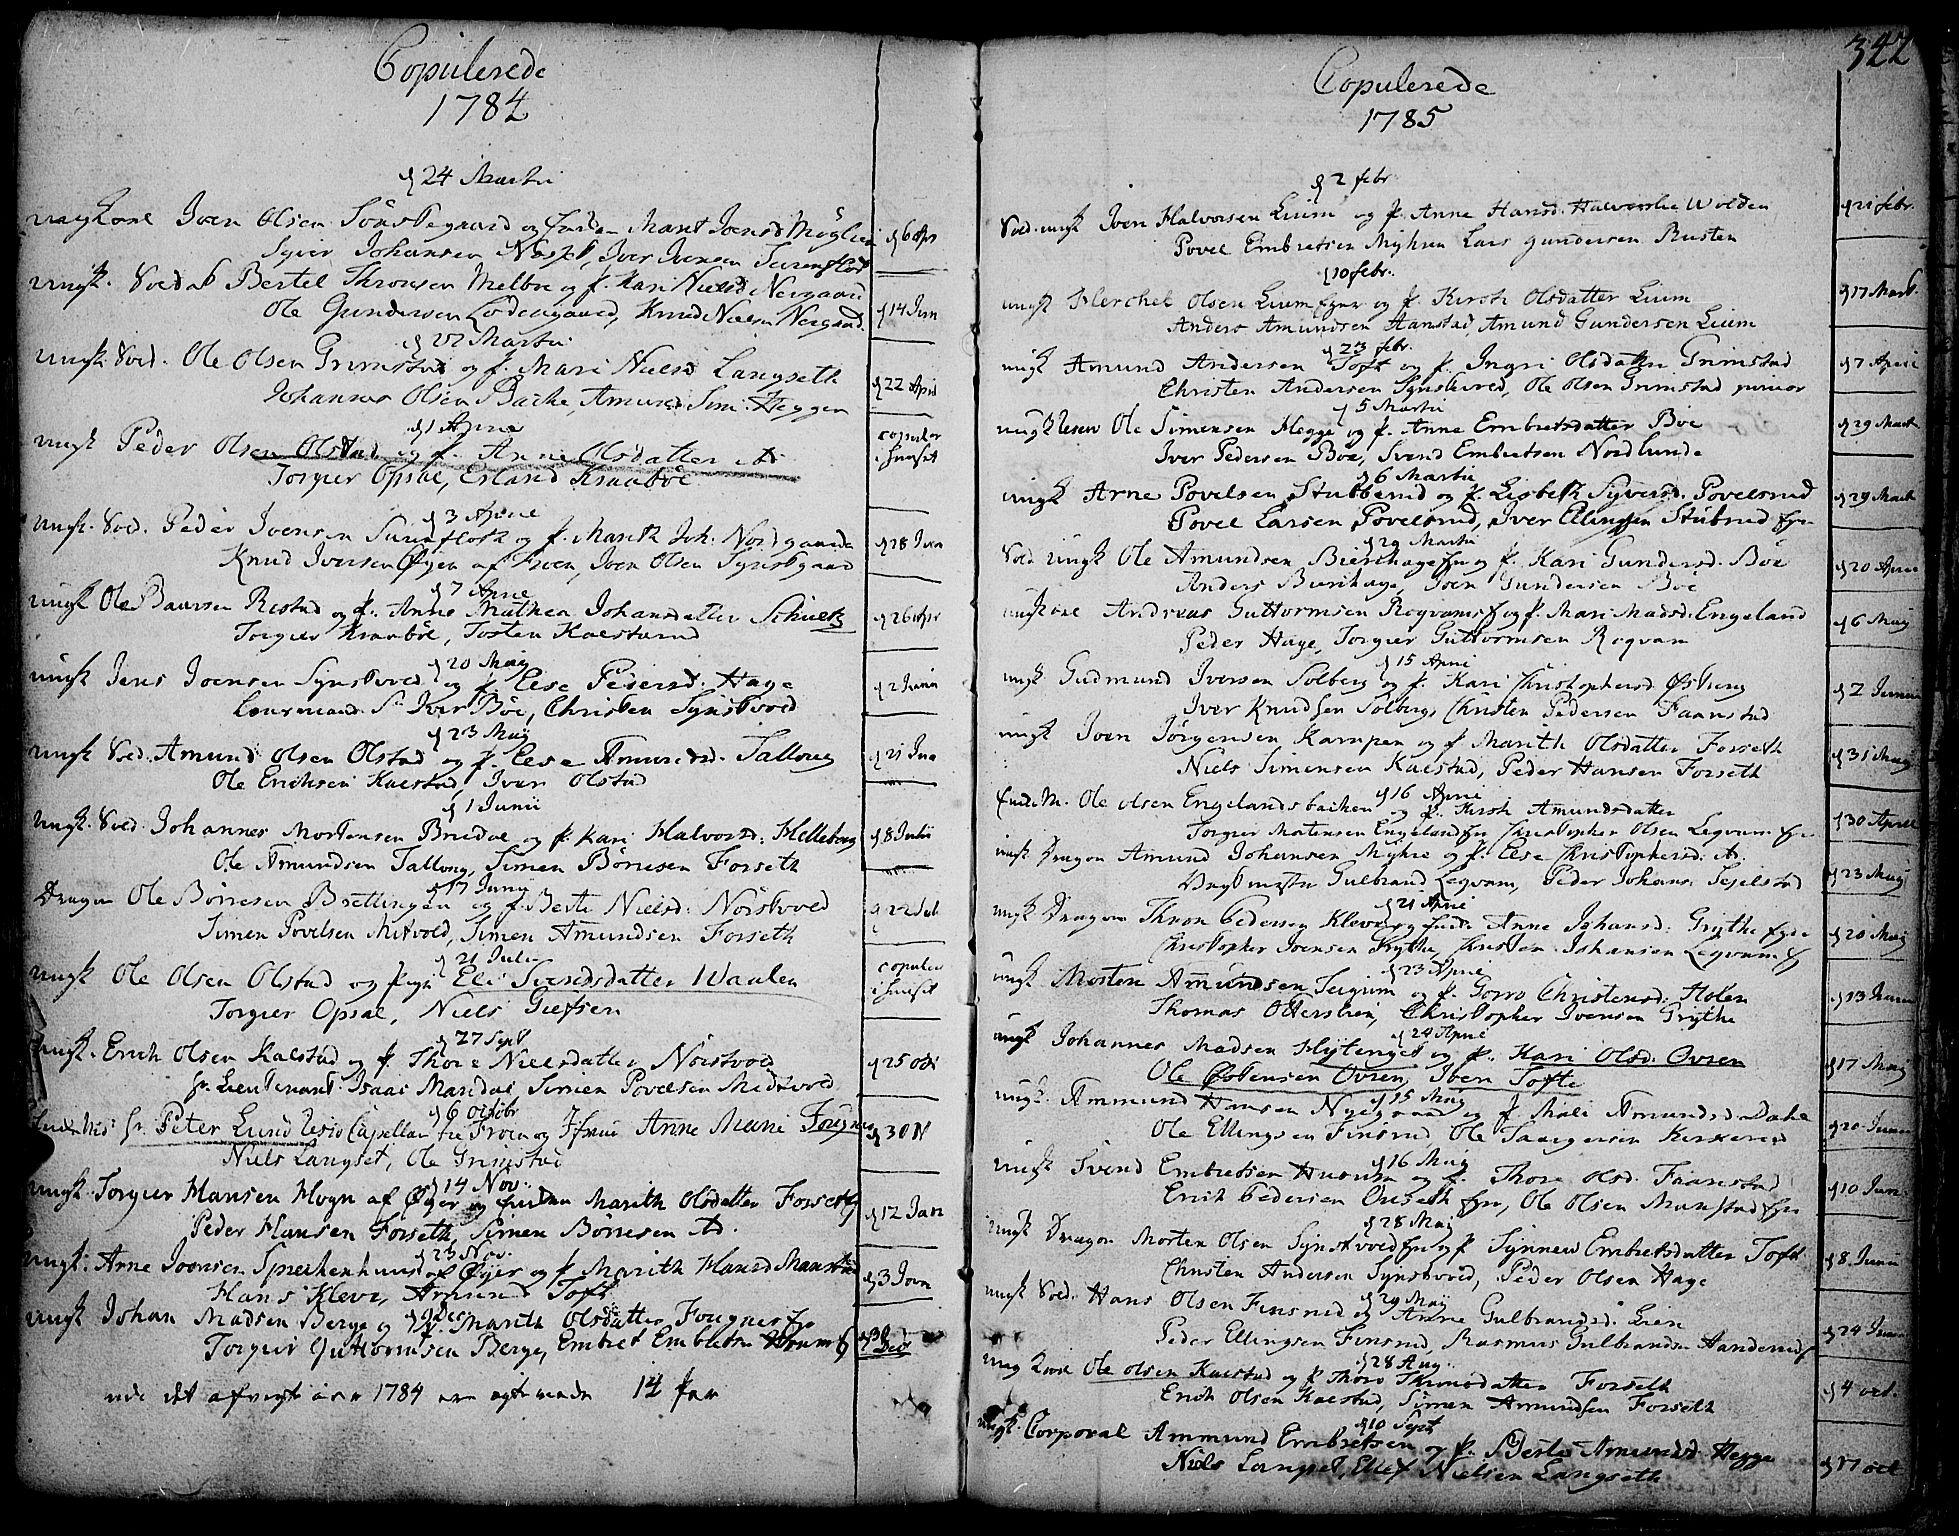 SAH, Gausdal prestekontor, Ministerialbok nr. 3, 1758-1809, s. 342